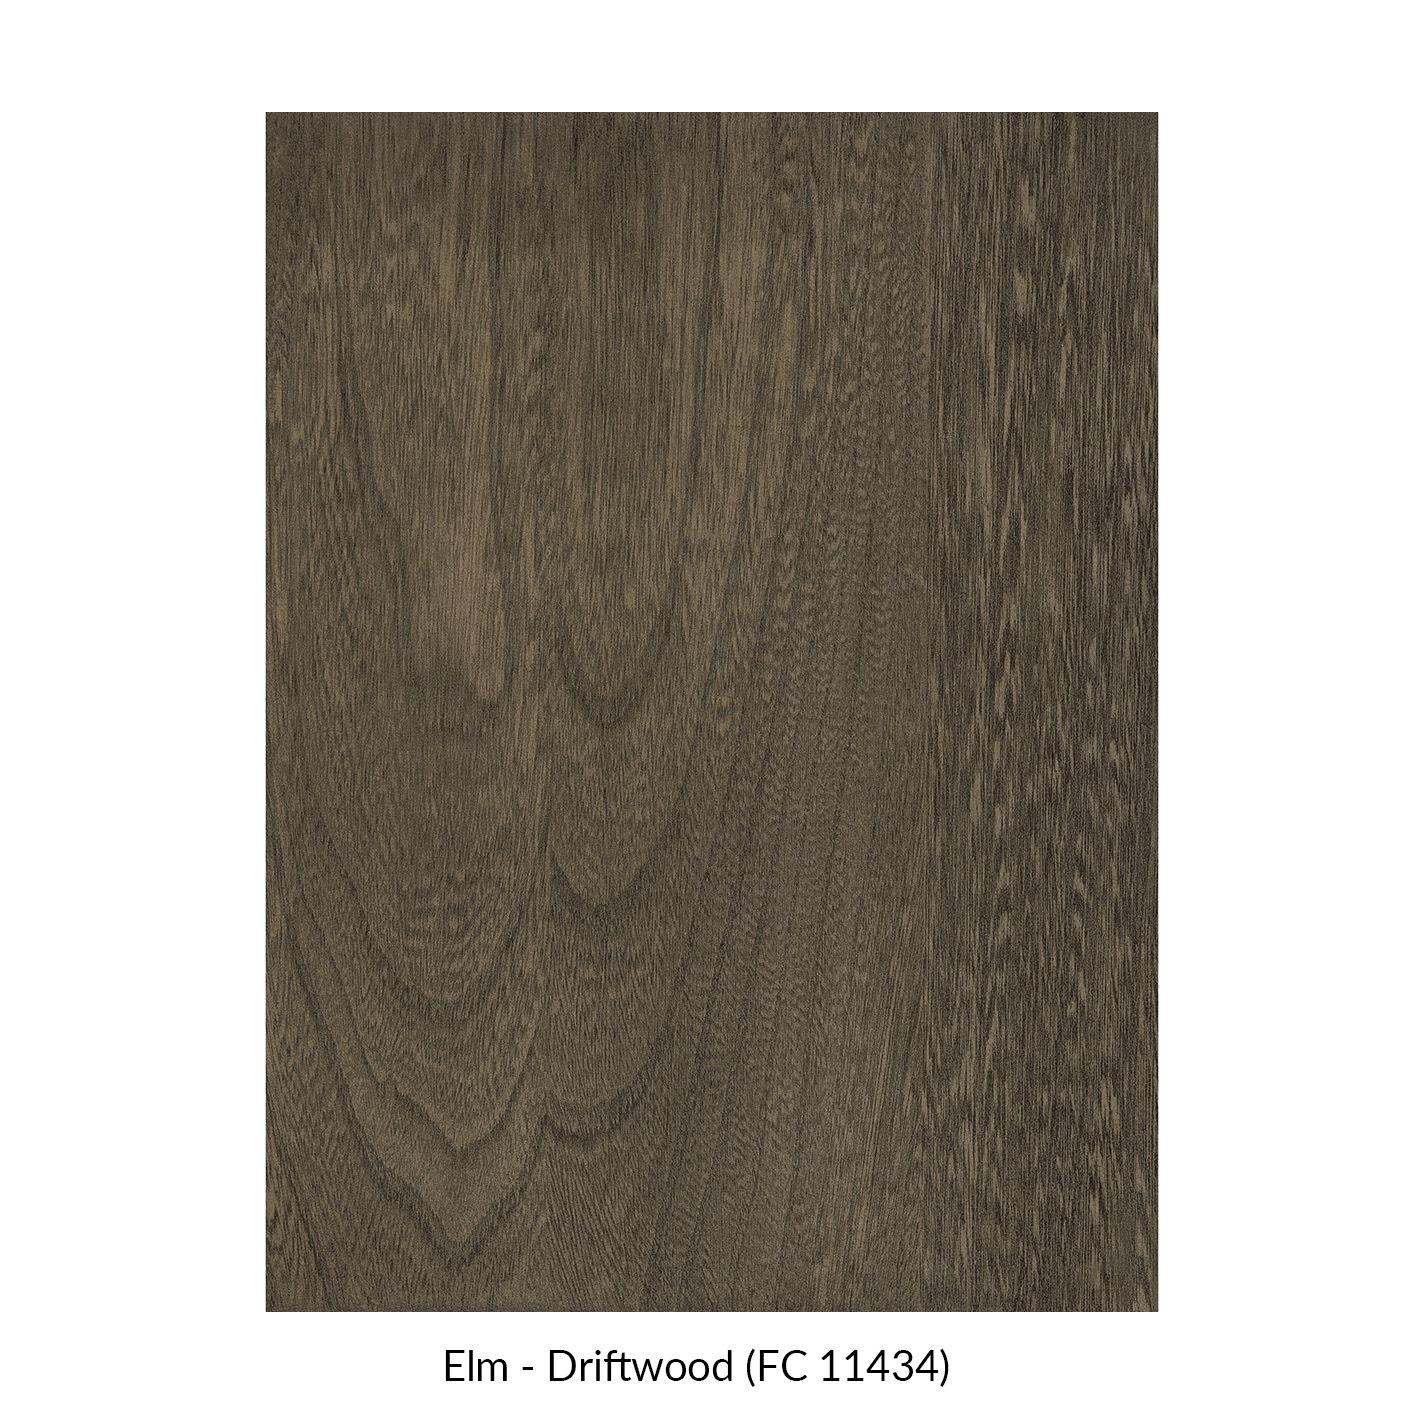 spectrum-elm-driftwood-fc-11434.jpg